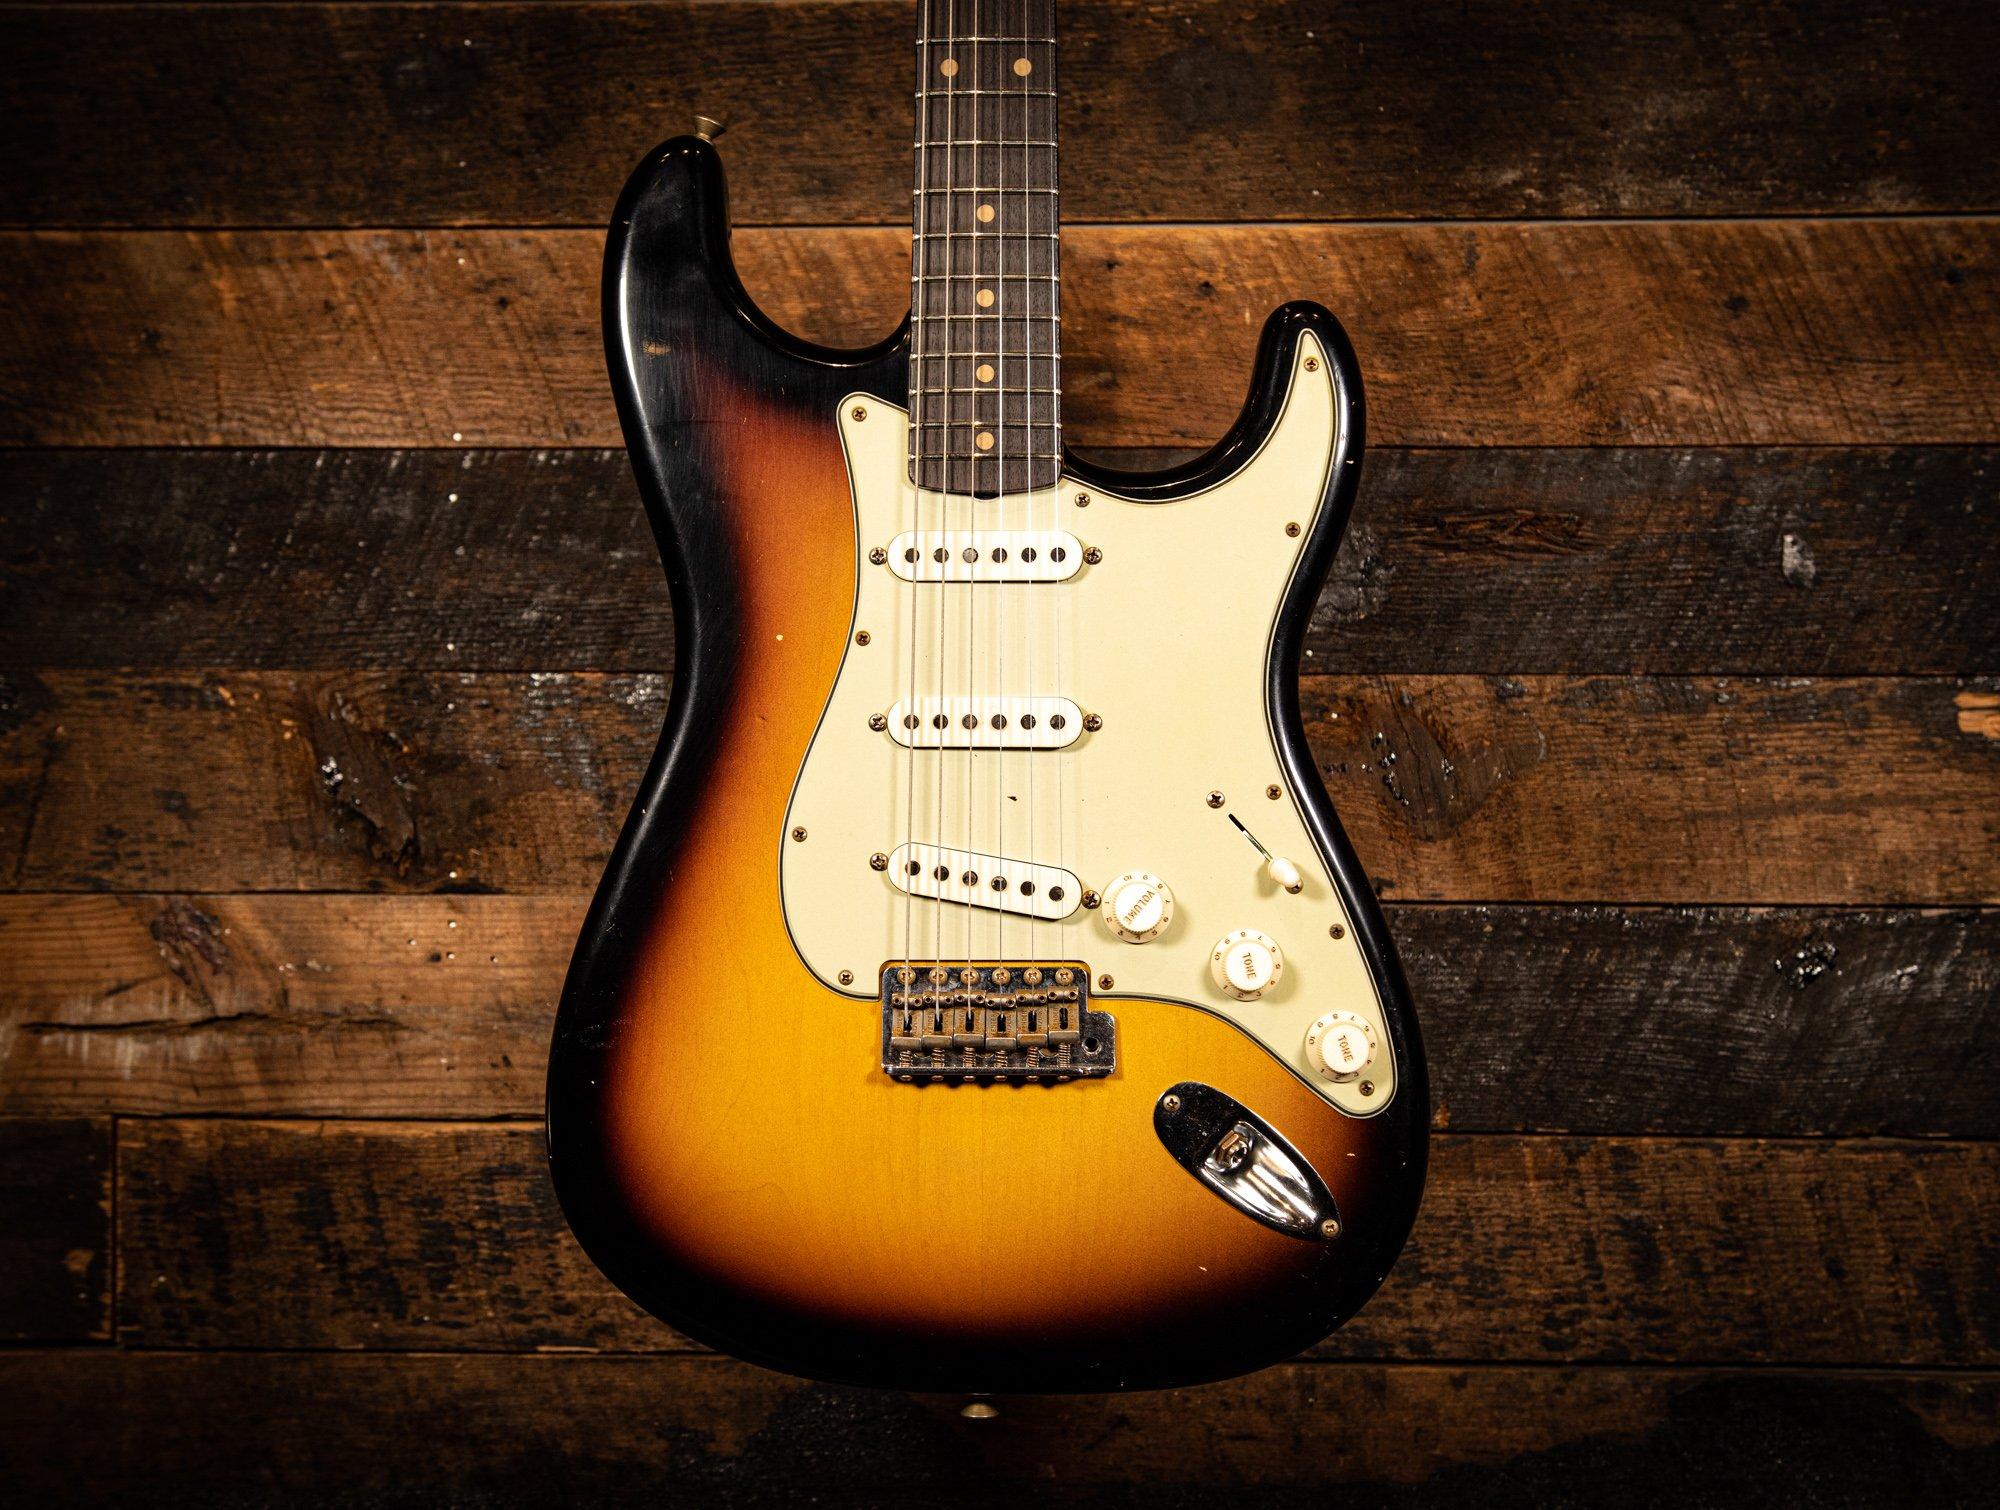 Fender Custom Shop LTD 1960's Stratocaster Journeyman Relic Faded Aged 3-tone Sunburst